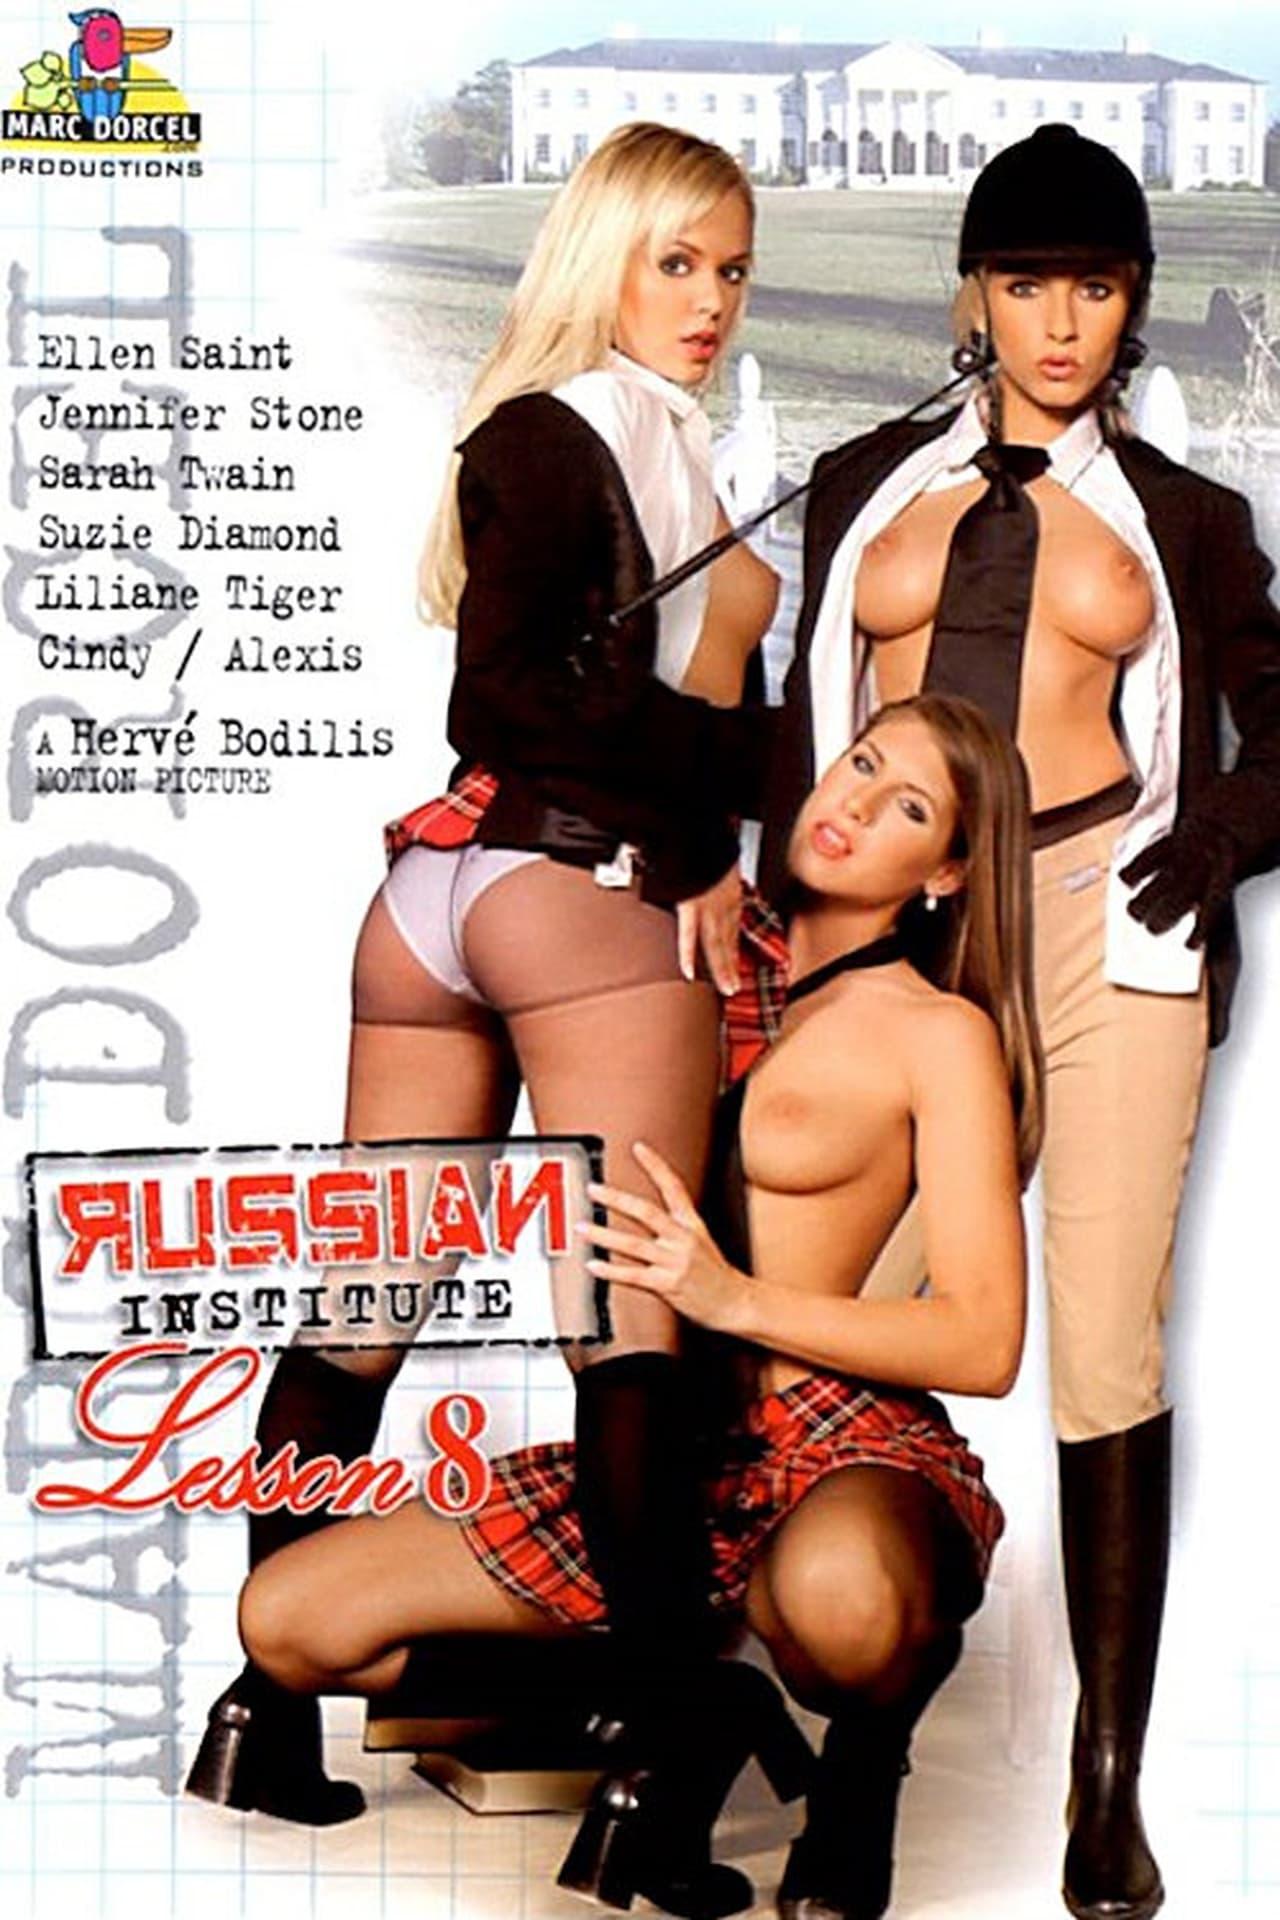 Russian Institute: Lesson 8